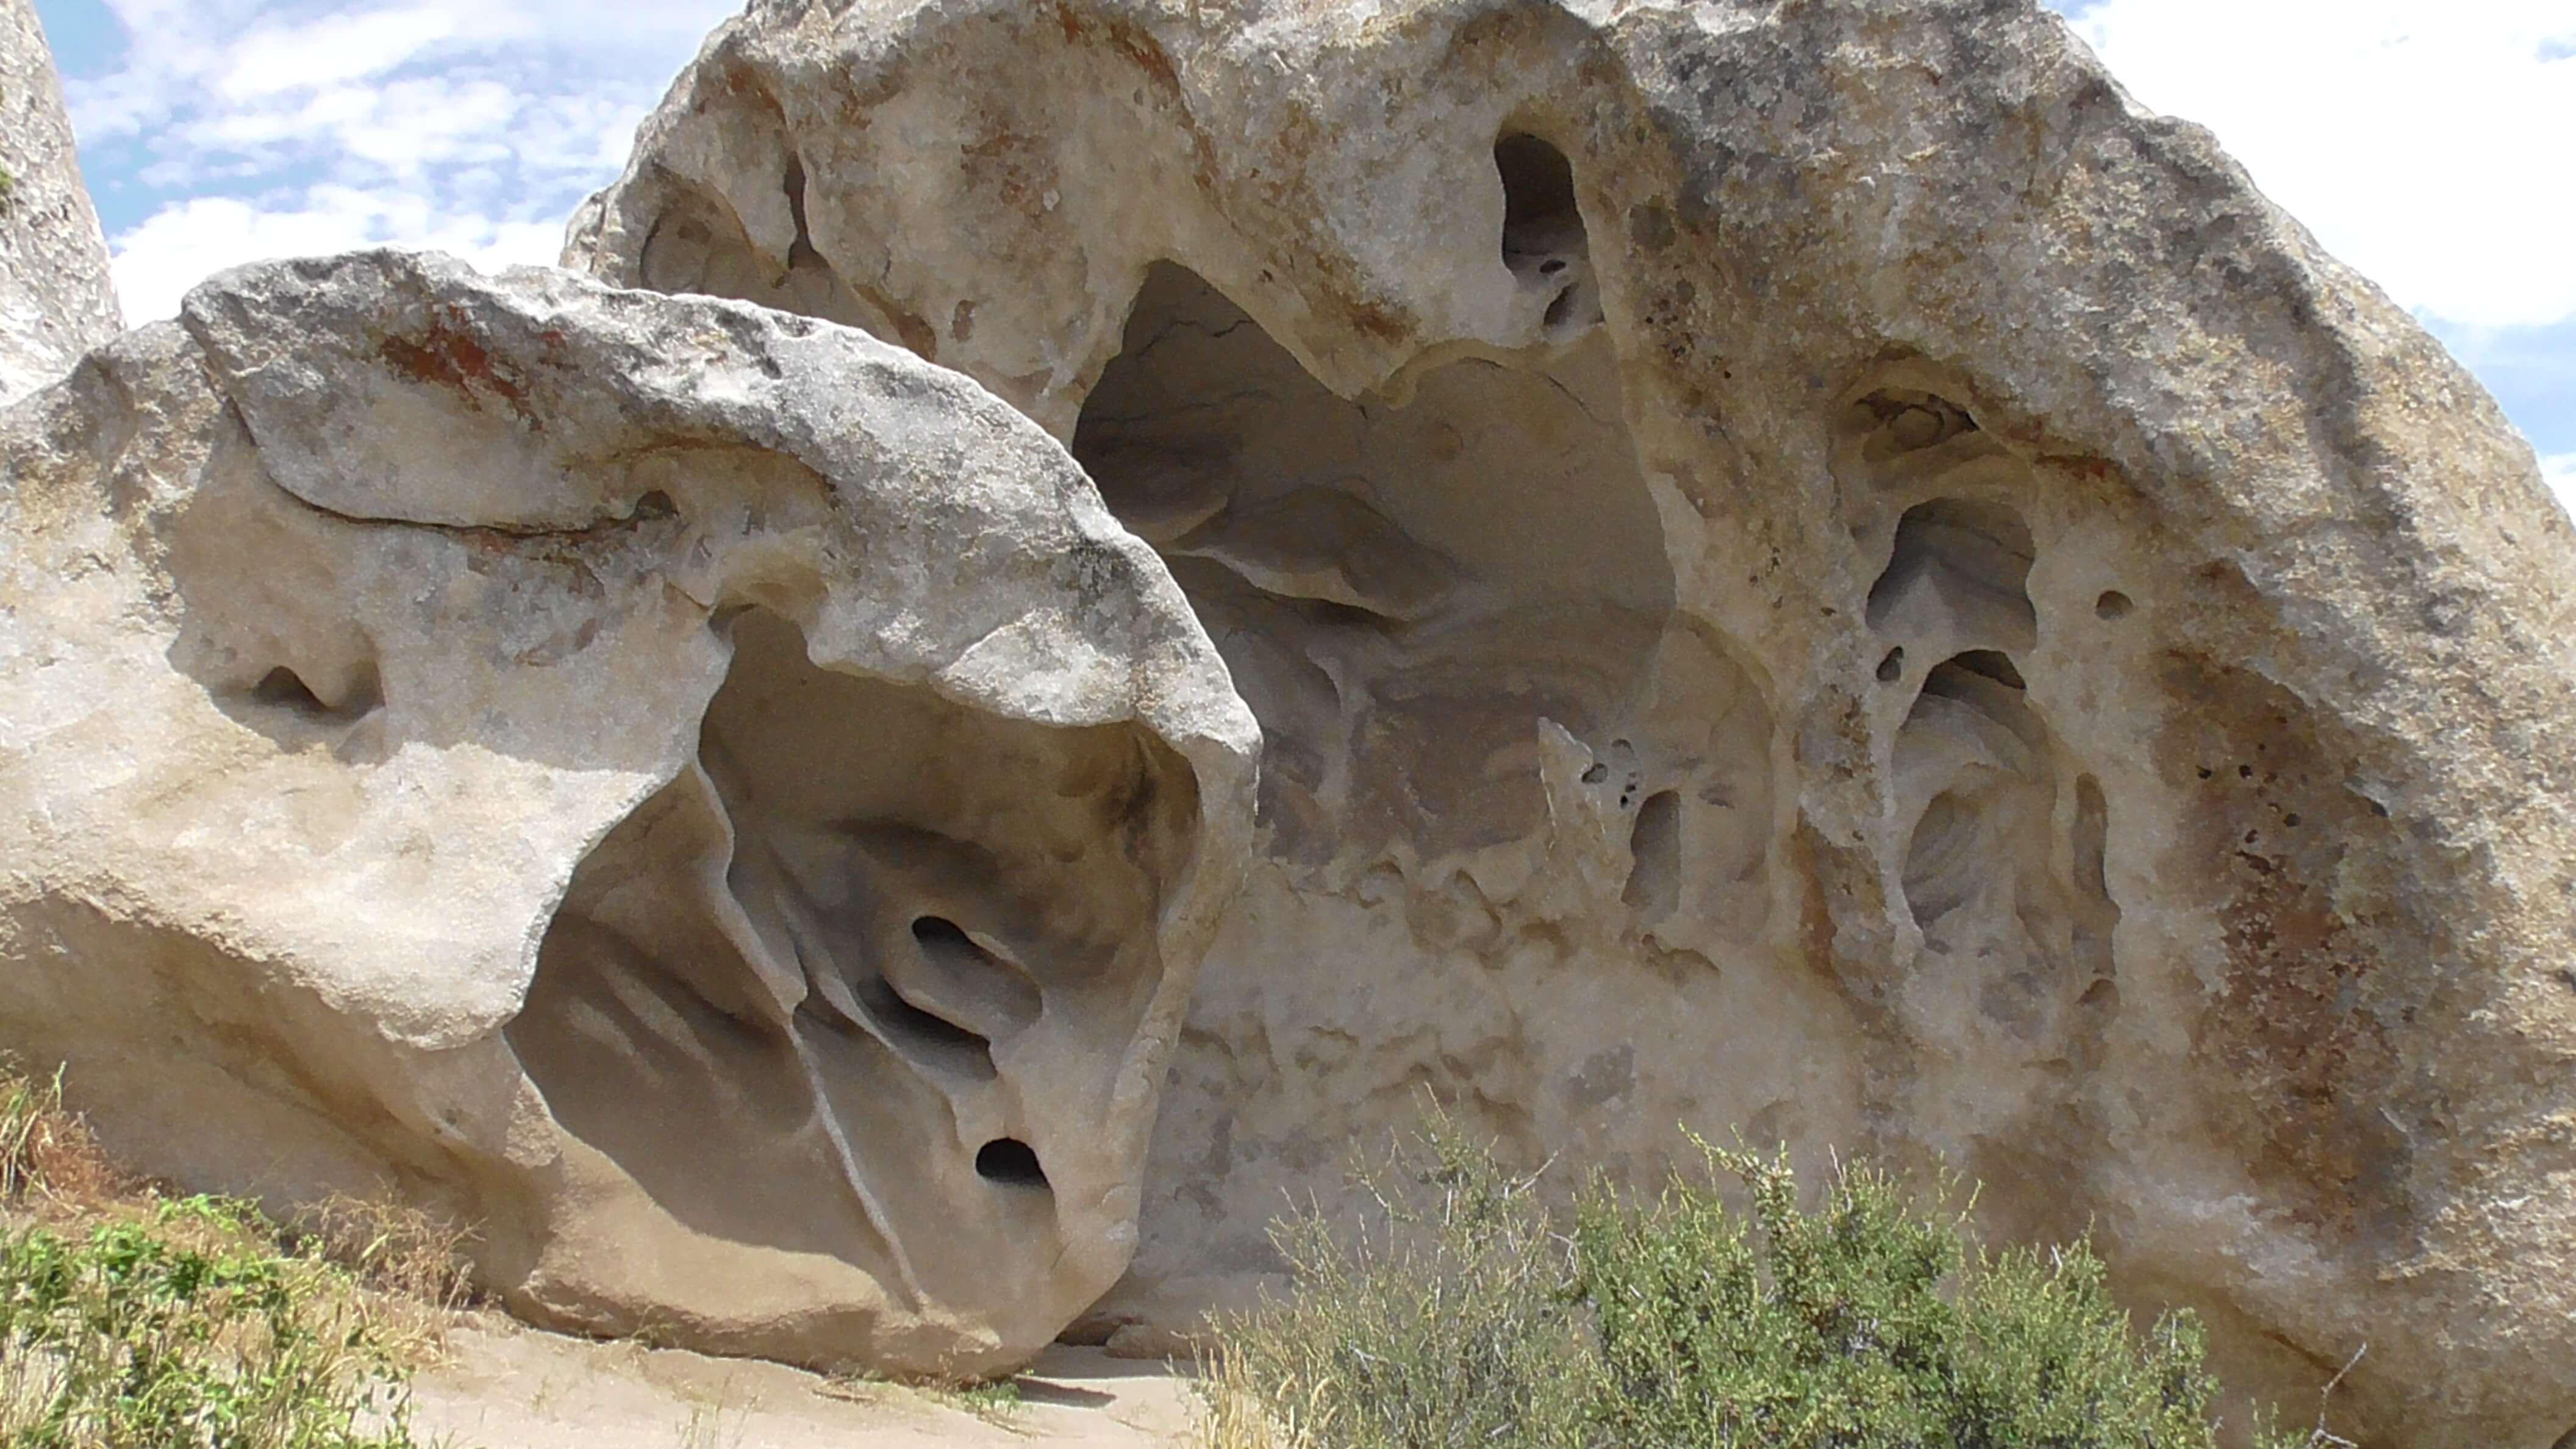 Erosion, City of Rocks National Reserve, Idaho